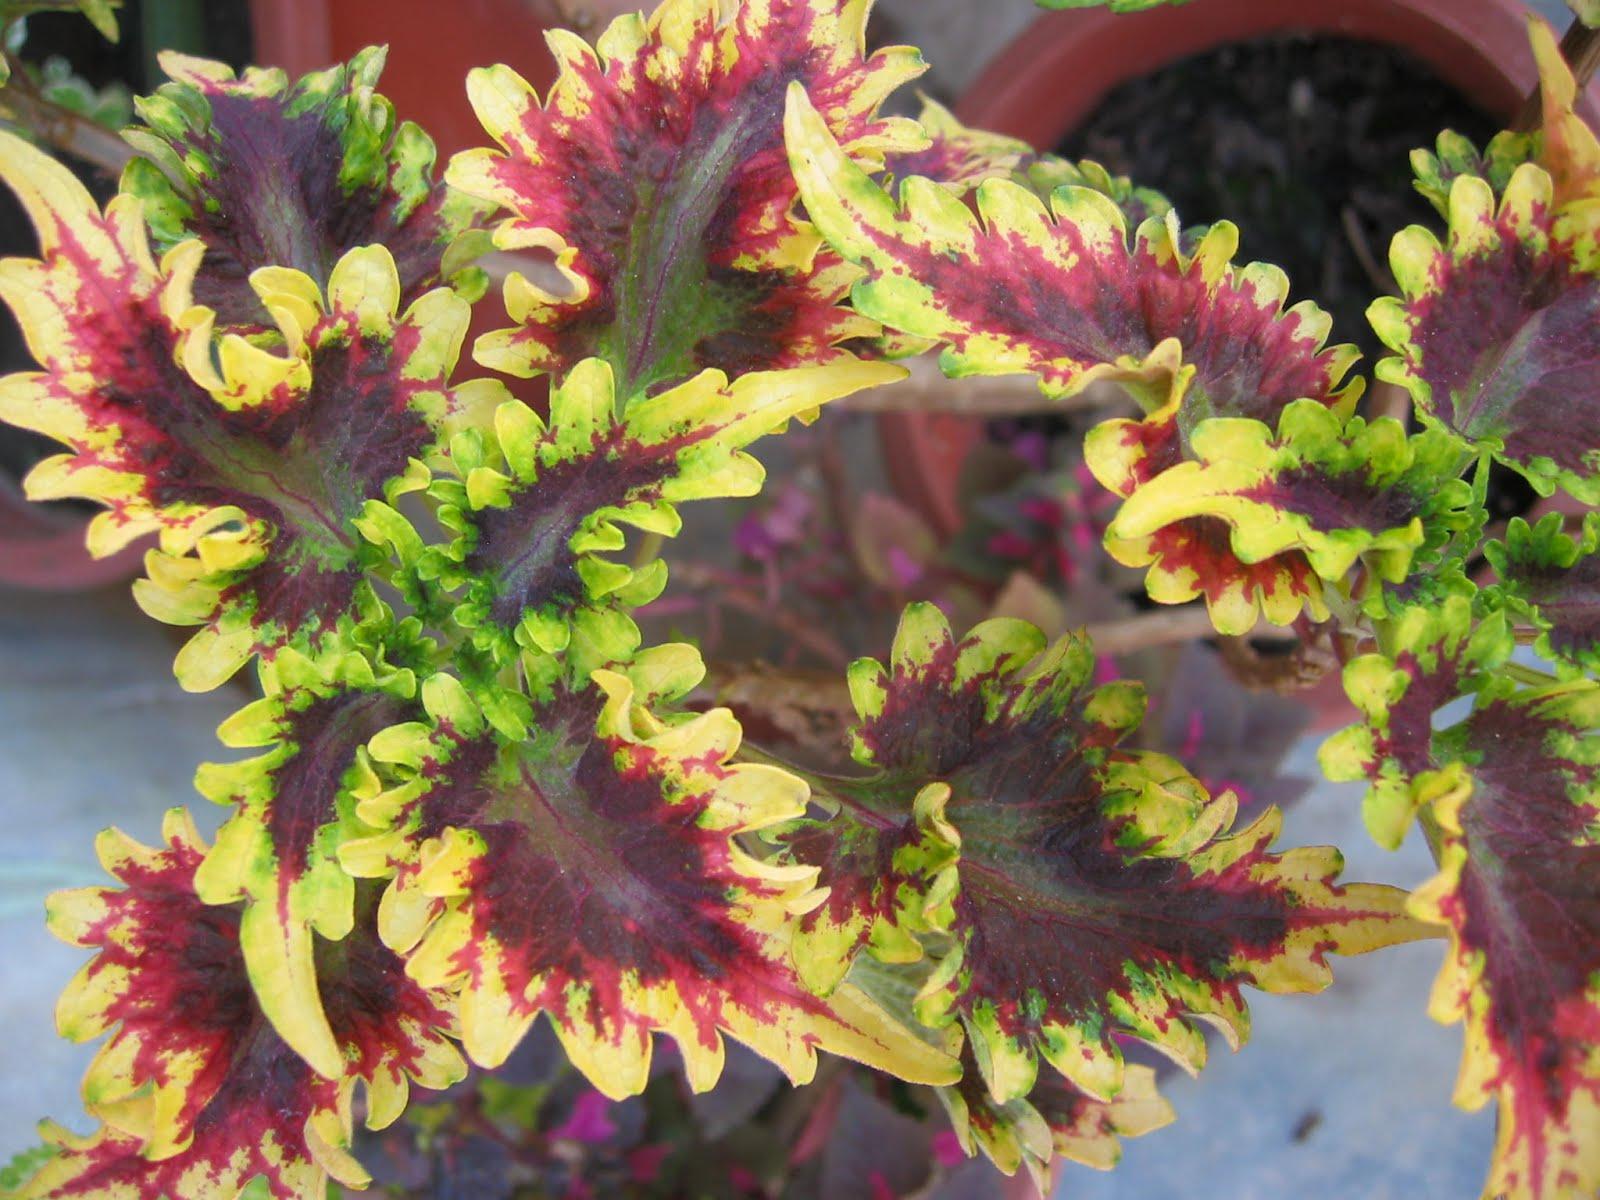 pembelajaran sains tumbuhan melalui internet ciri 7